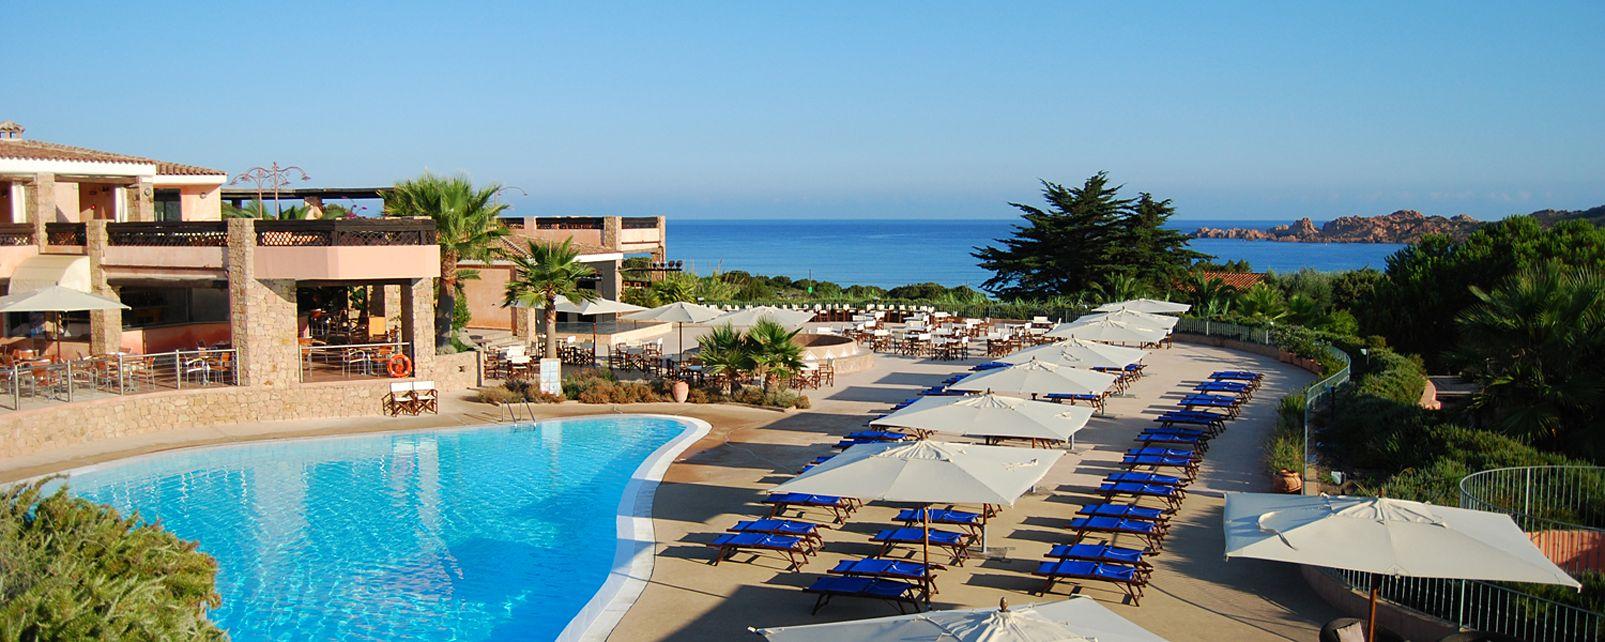 Hôtel Hôtel Marinedda Thalasso SPA